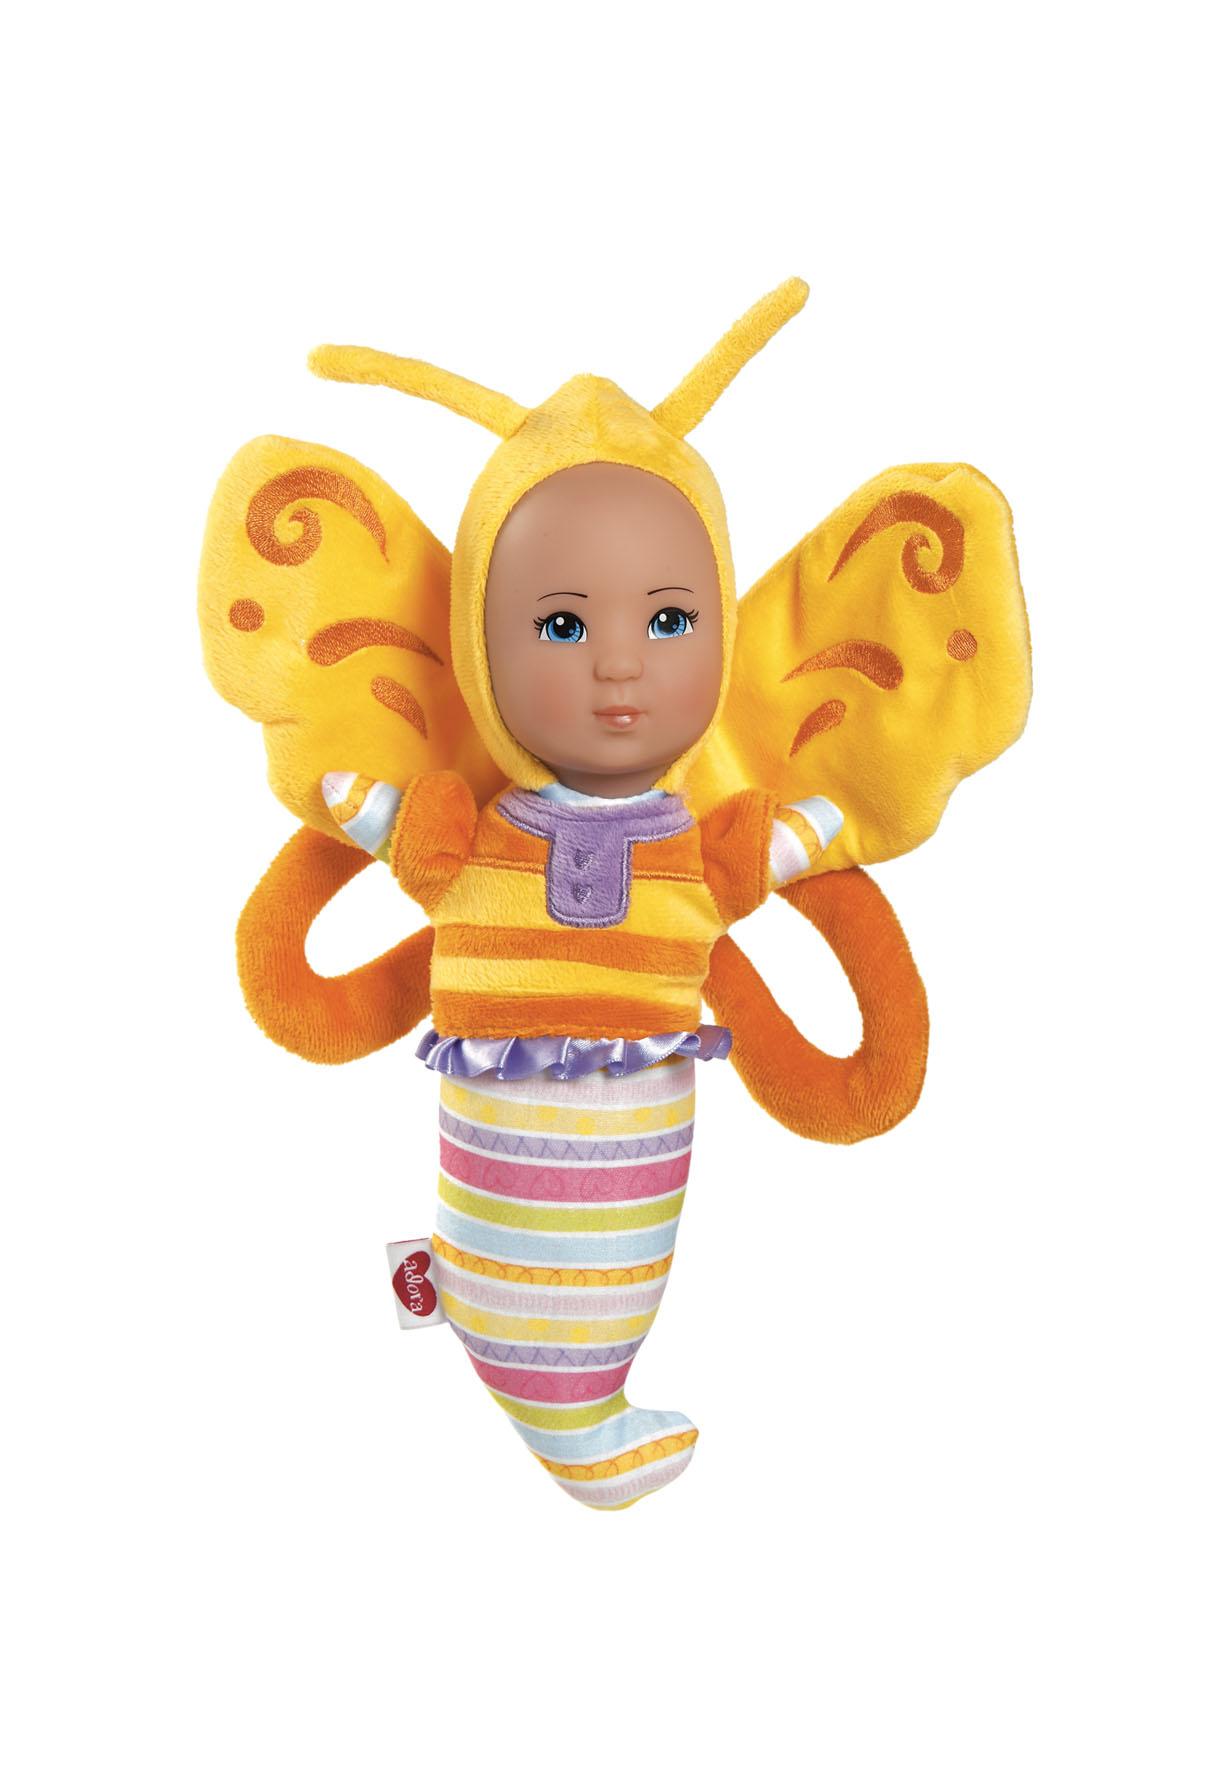 Кукла с крыльями ПчелкаКуклы Адора<br>Кукла с крыльями Пчелка<br>